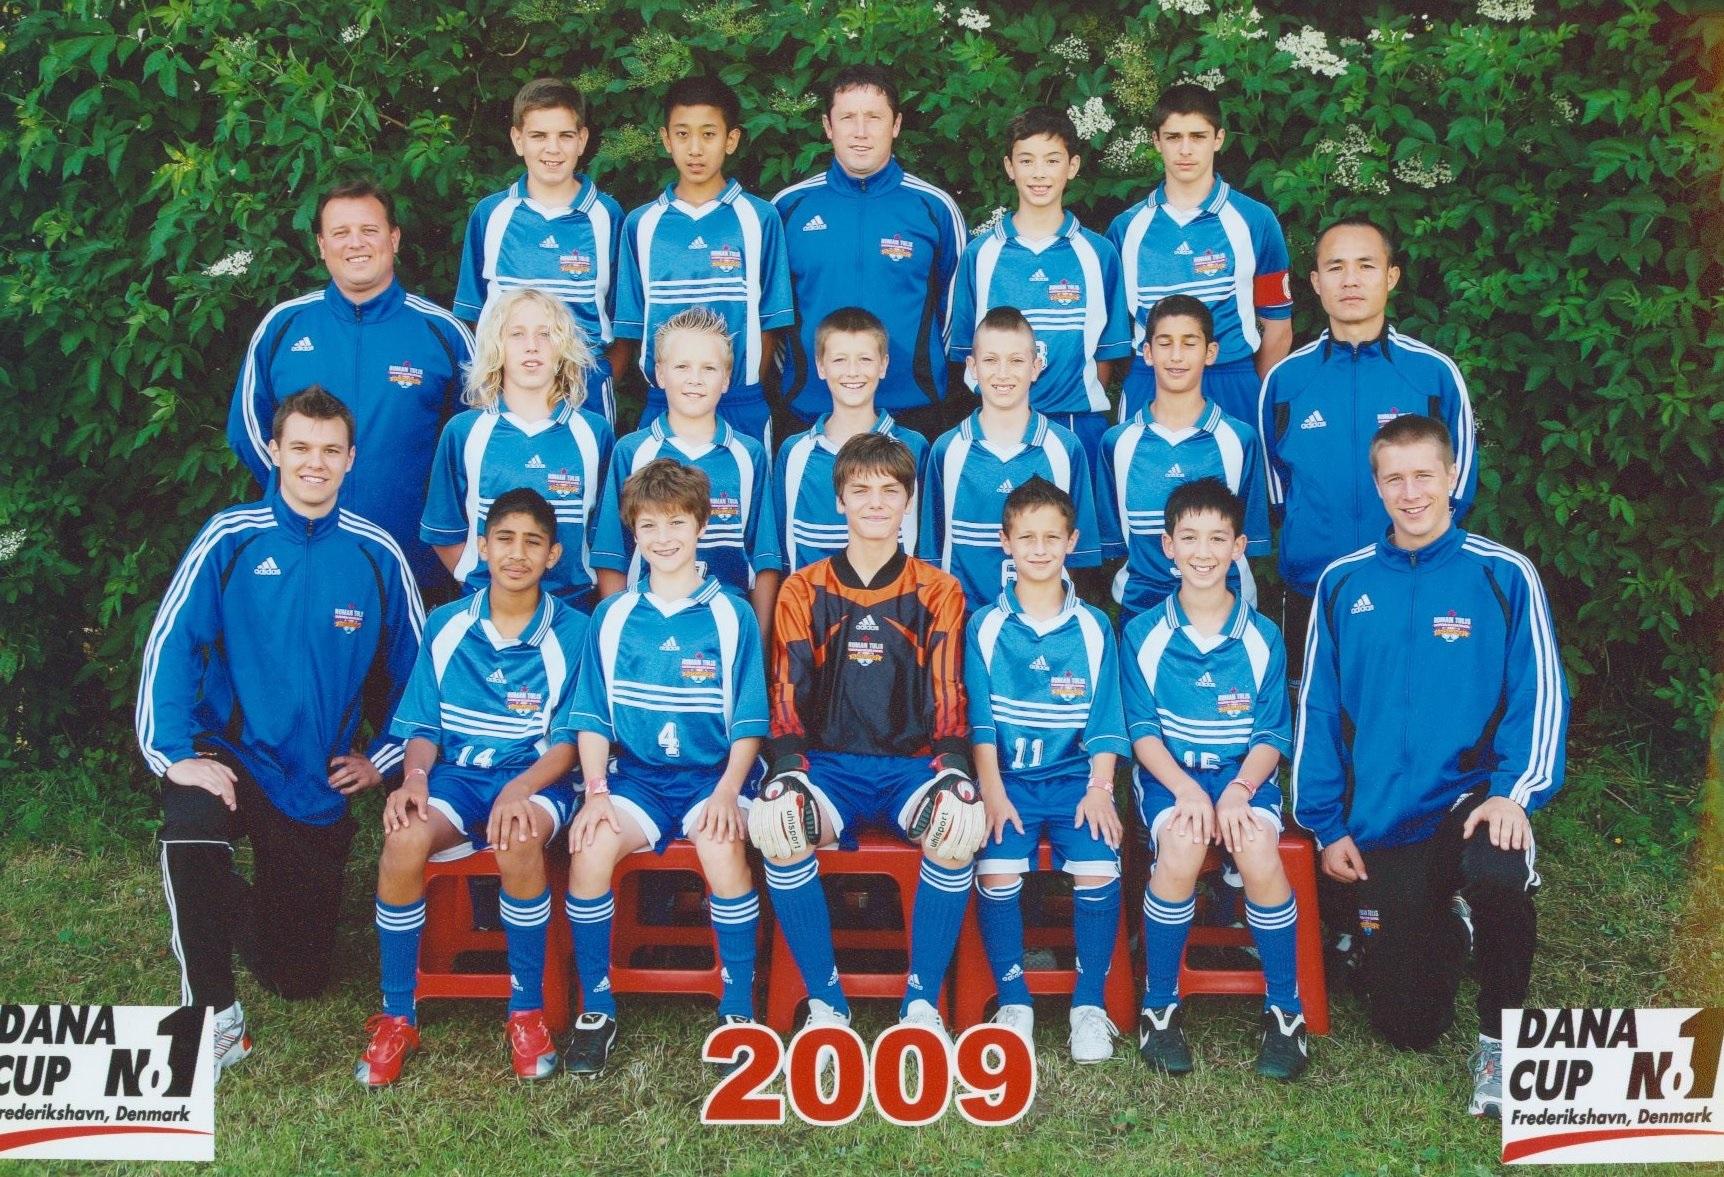 2009 Scandinavia Boys